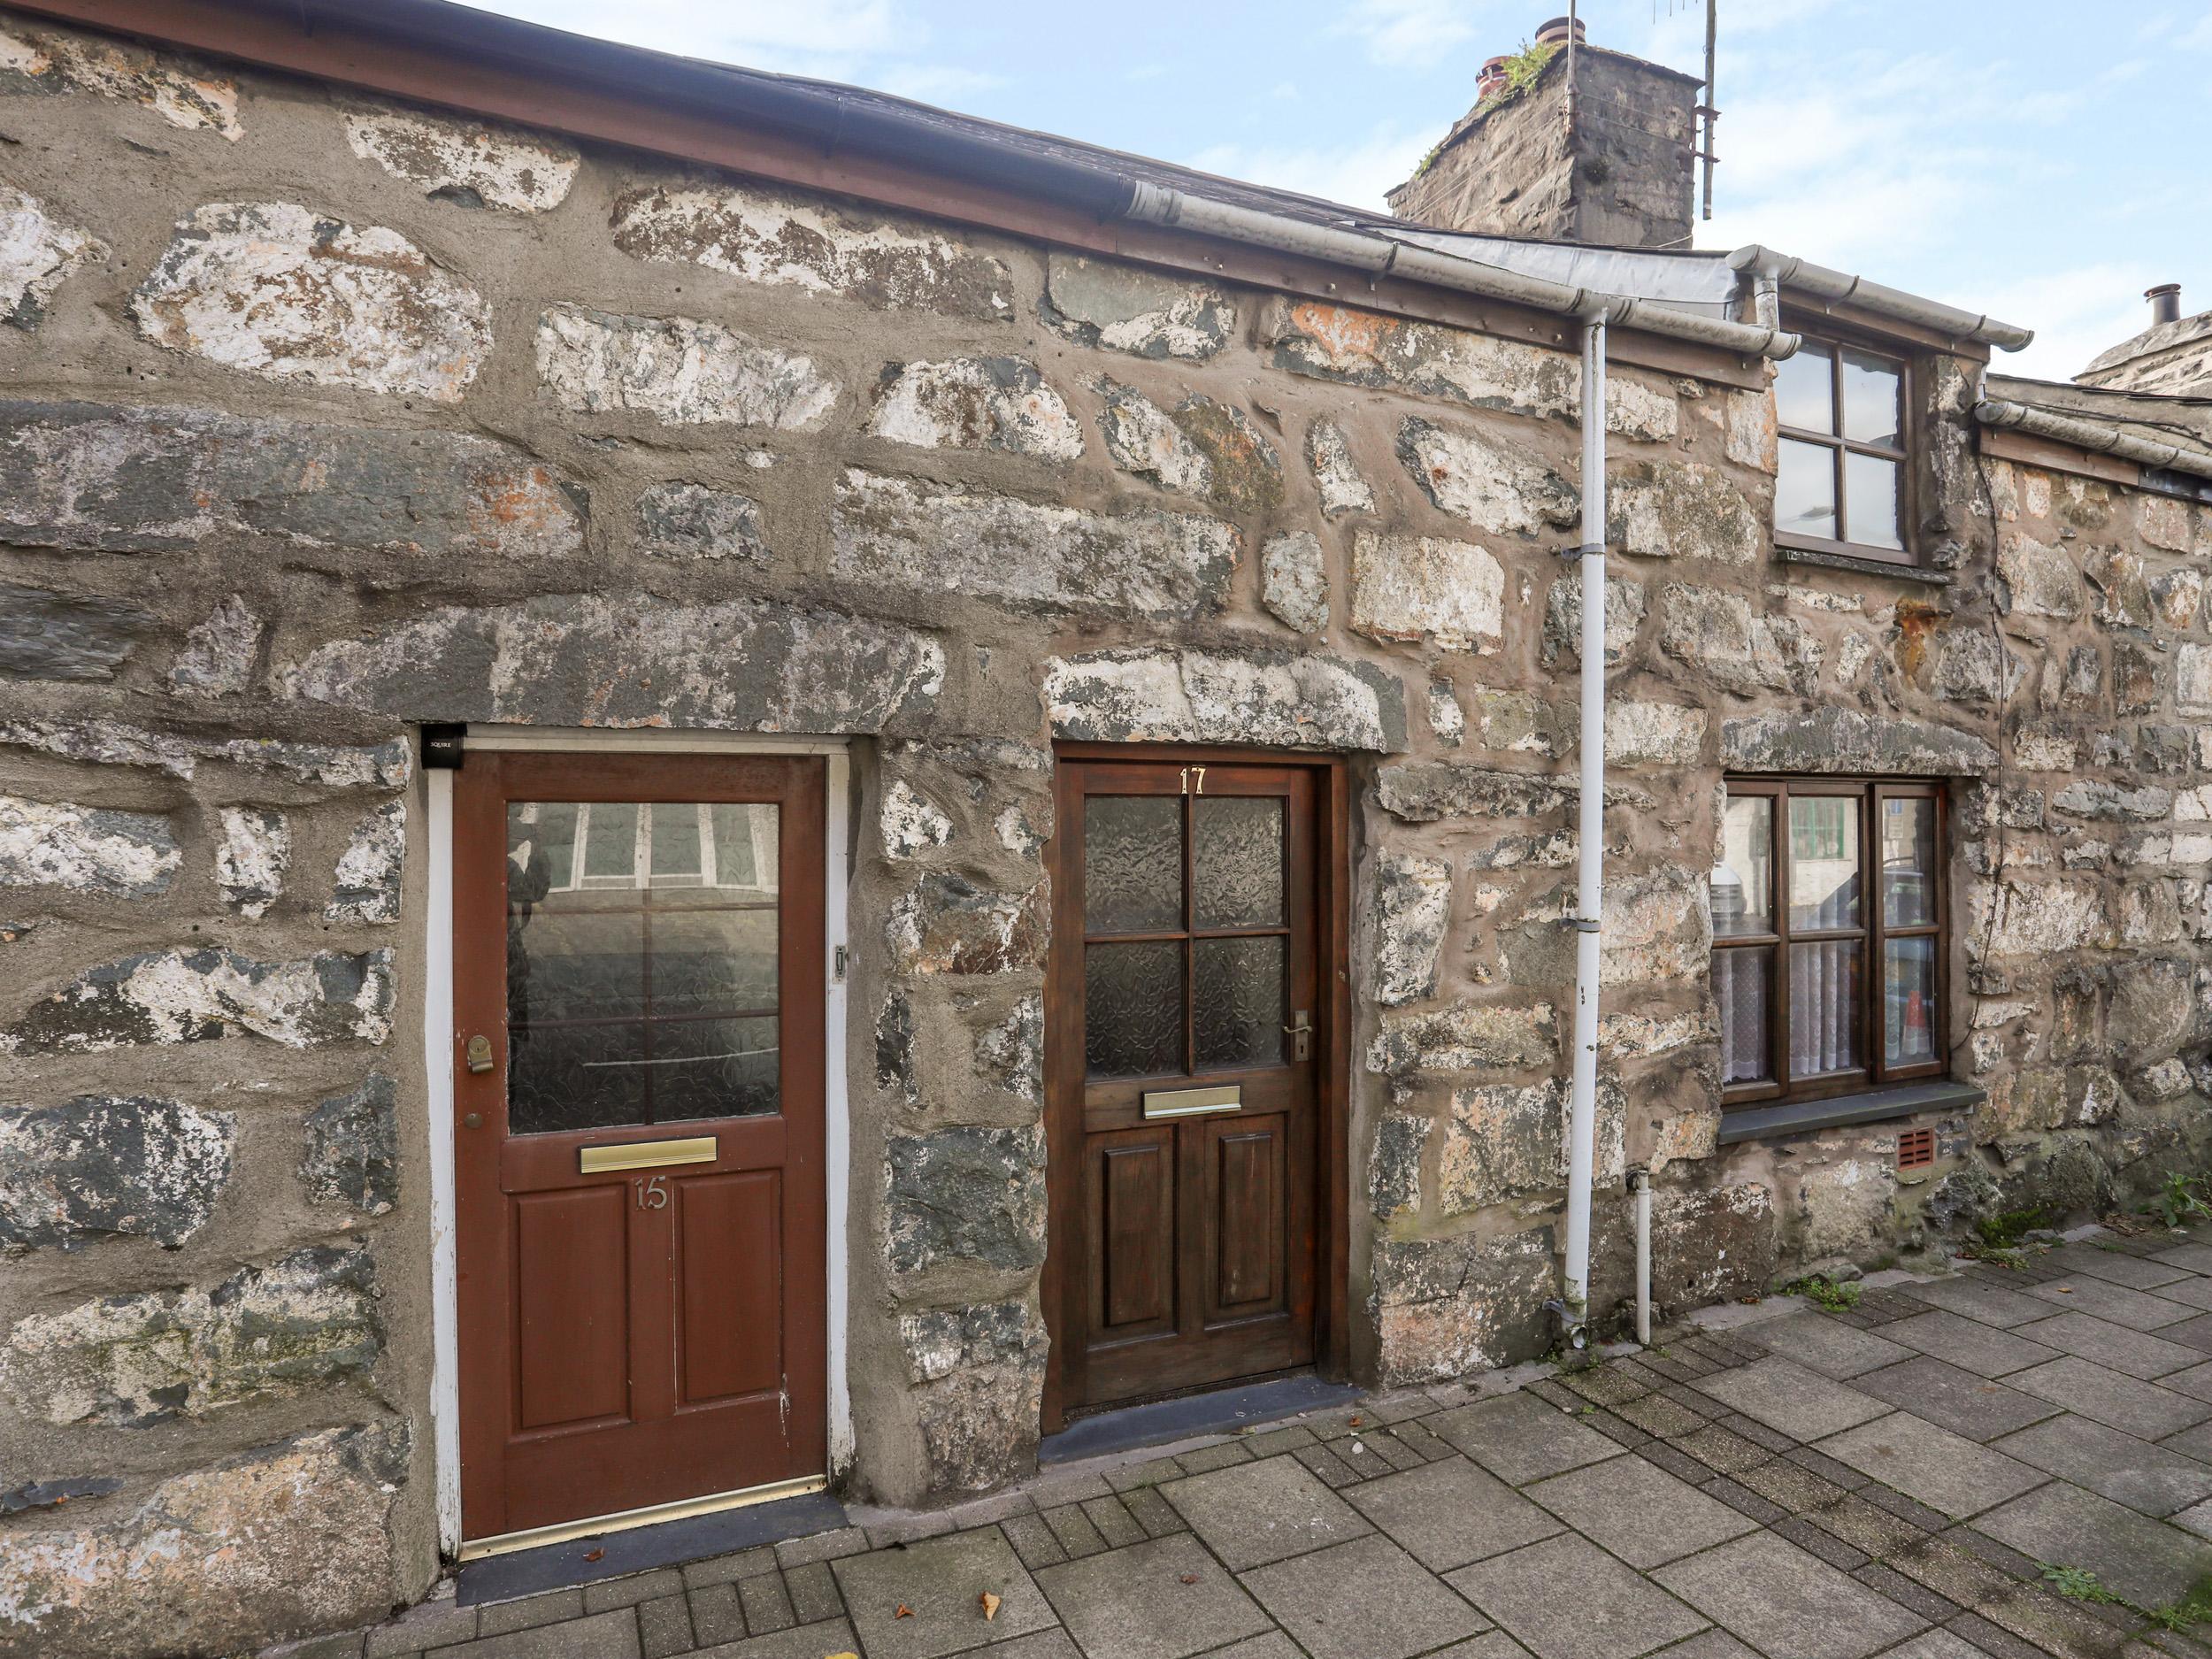 Holiday Cottage Reviews for 17 Dublin Street - Holiday Cottage in Porthmadog, Gwynedd